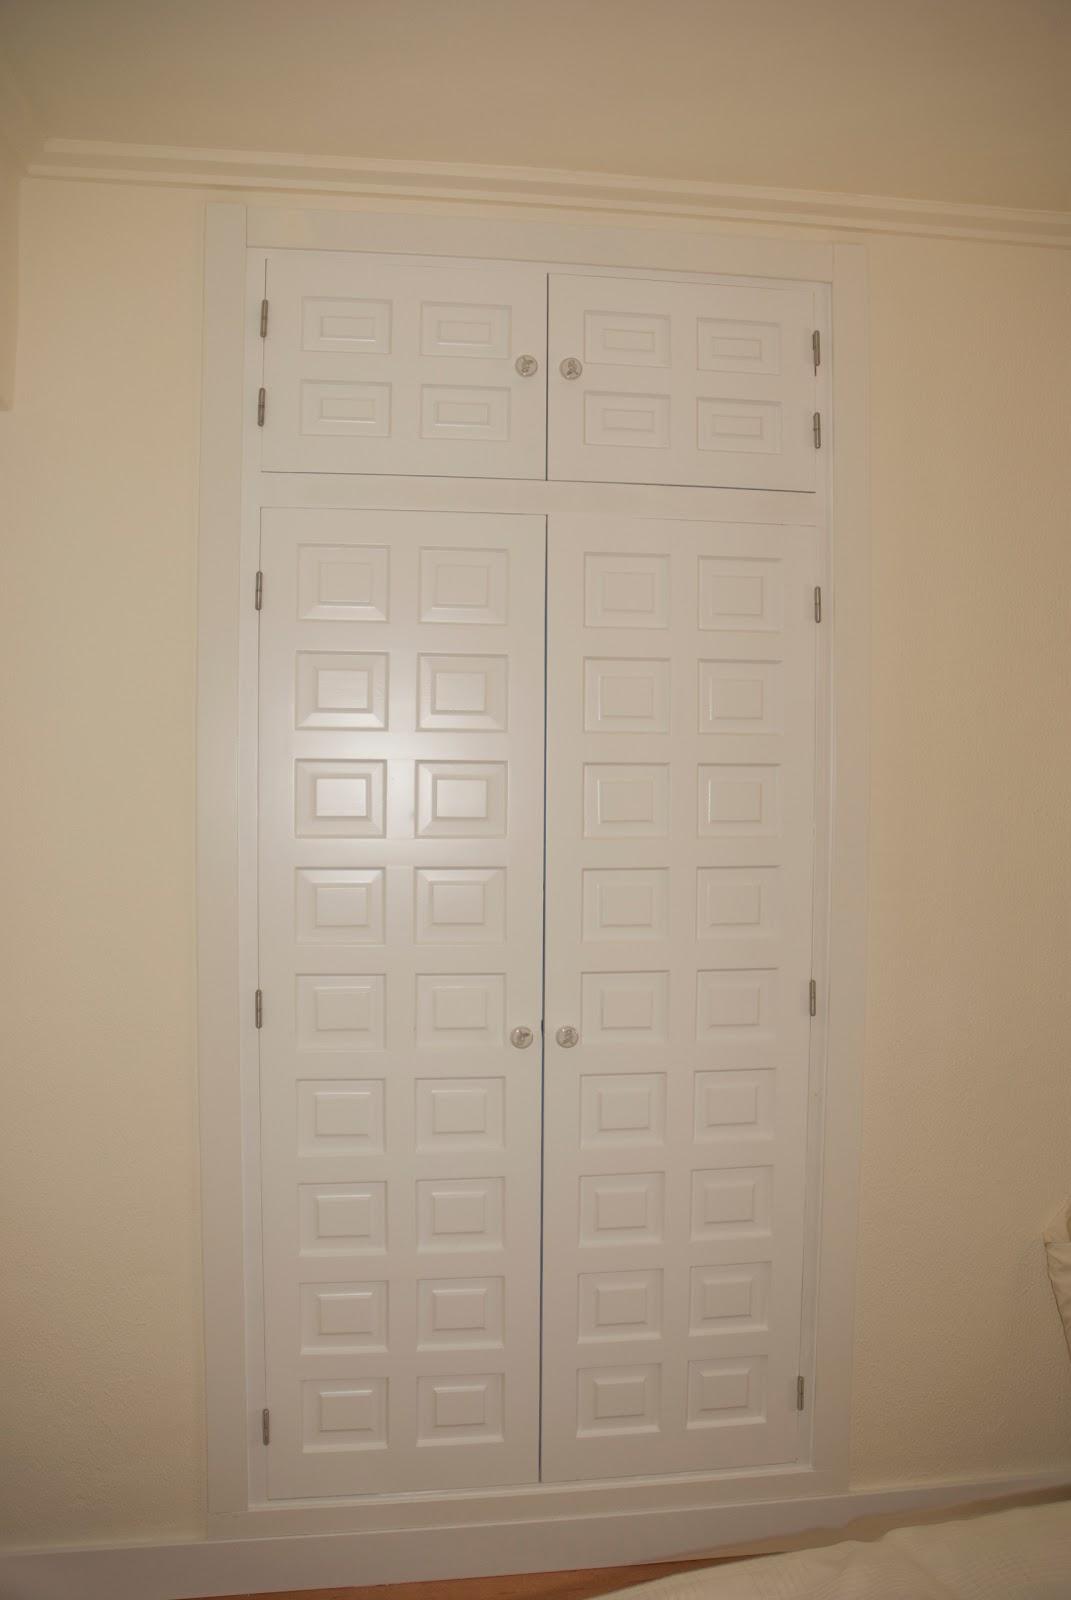 Caballito de cart n cambio aspecto puertas armario - Cambio de puertas ...